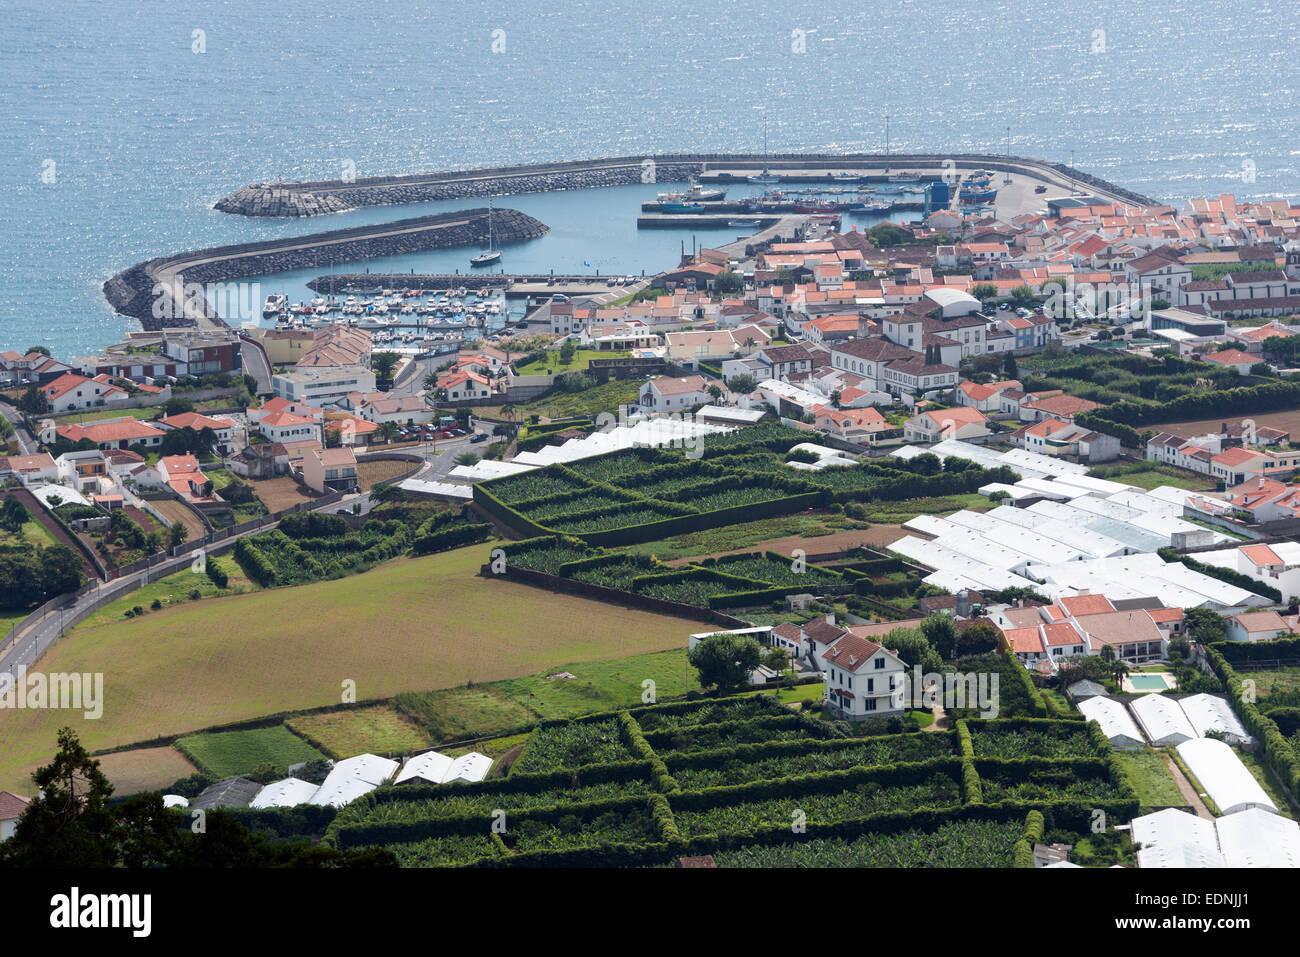 View of Vila Franca do Campo, Sao Miguel, Azores, Portugal - Stock Image